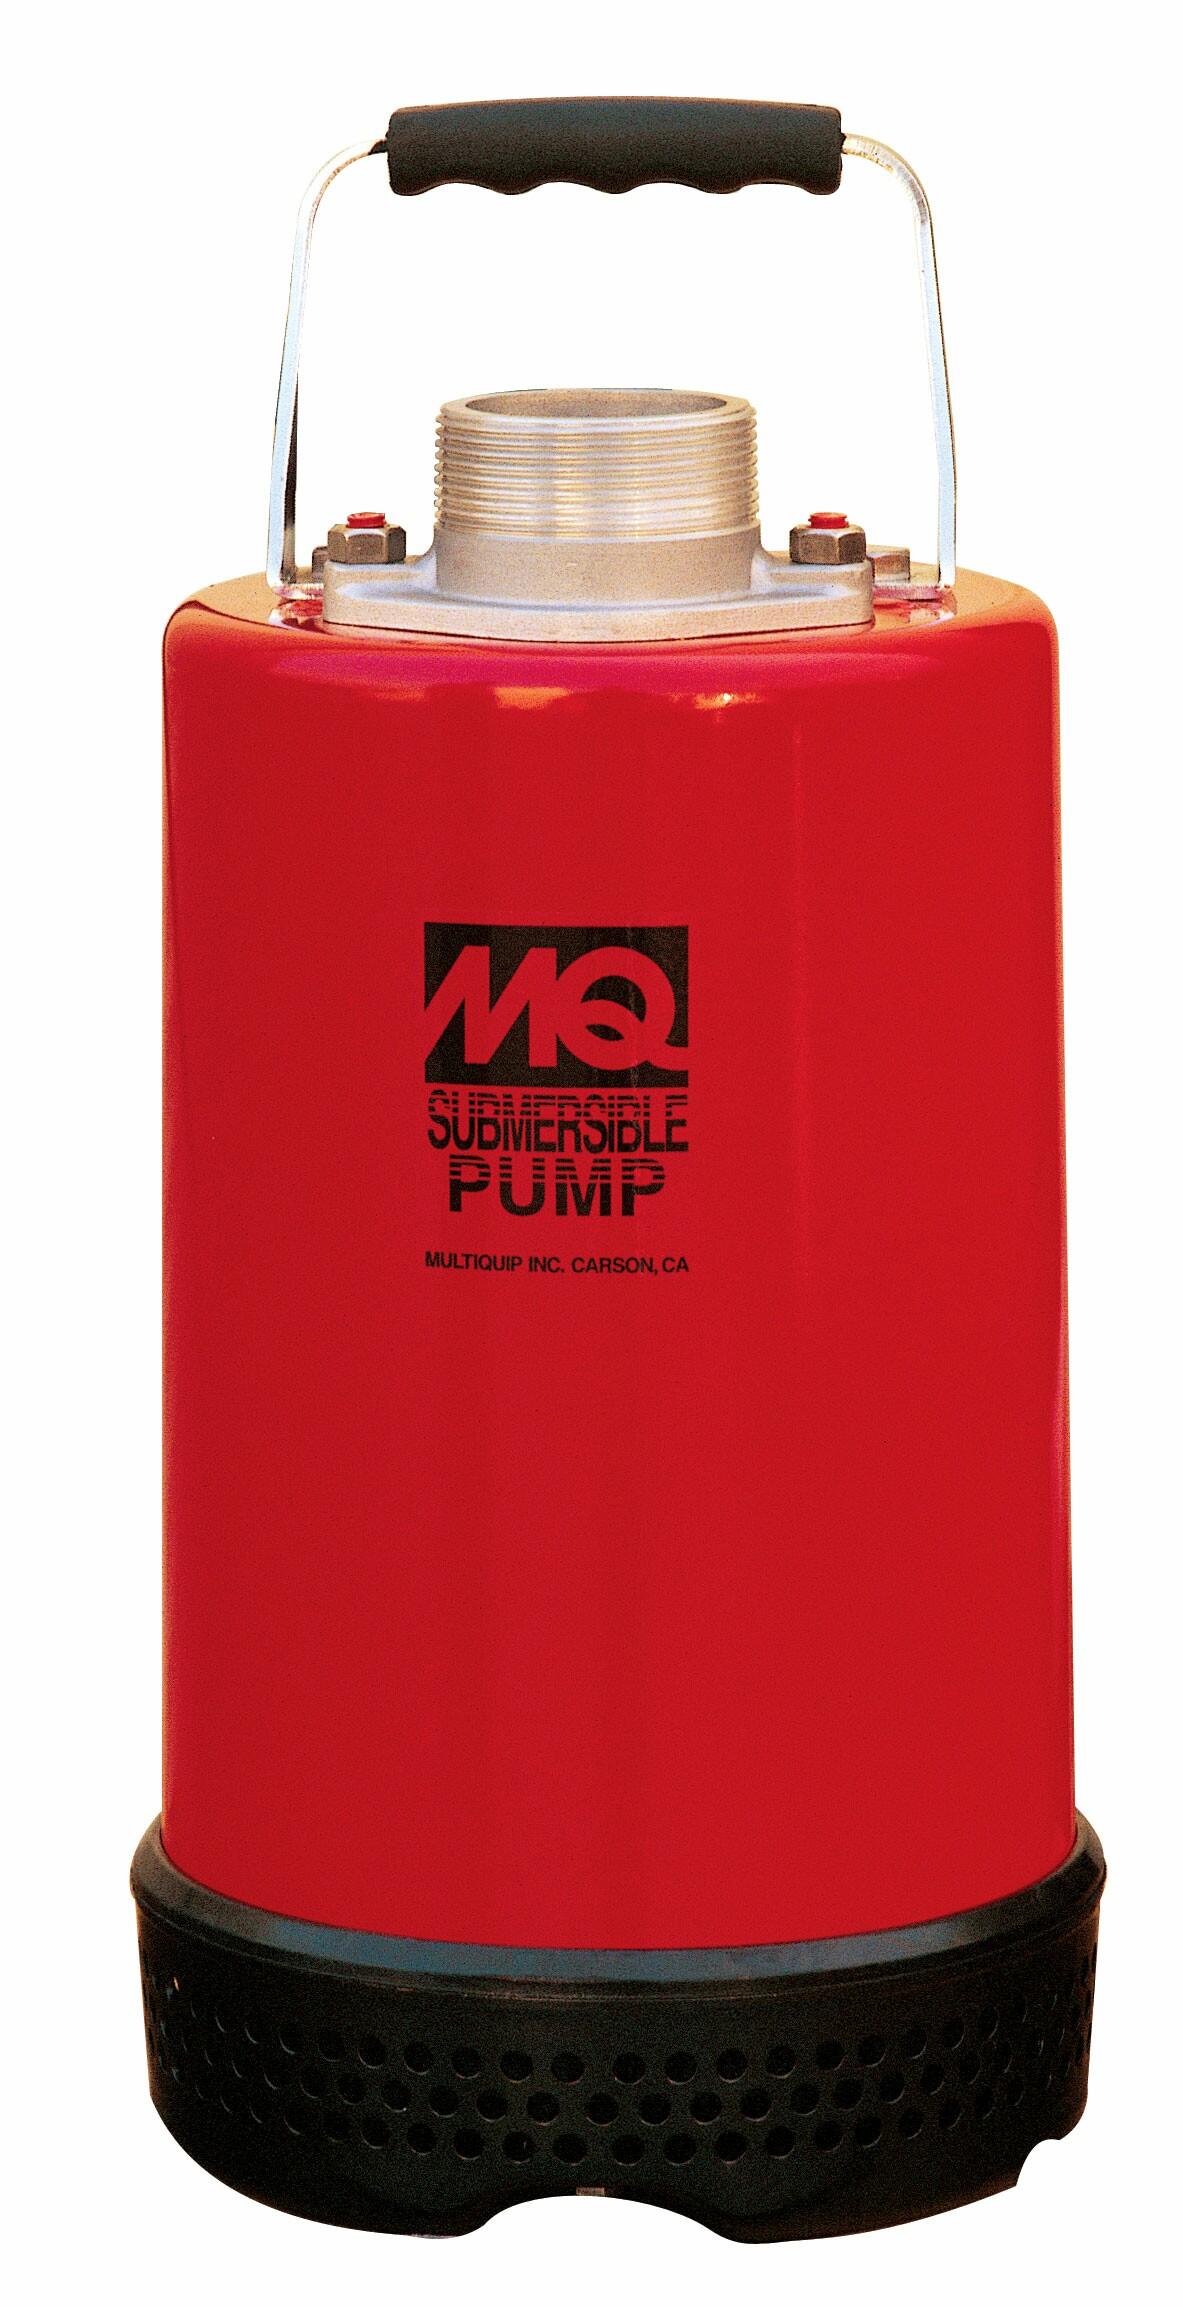 Submersible Pumps Rental Tsurumi Pump Wiring Diagram Pictures